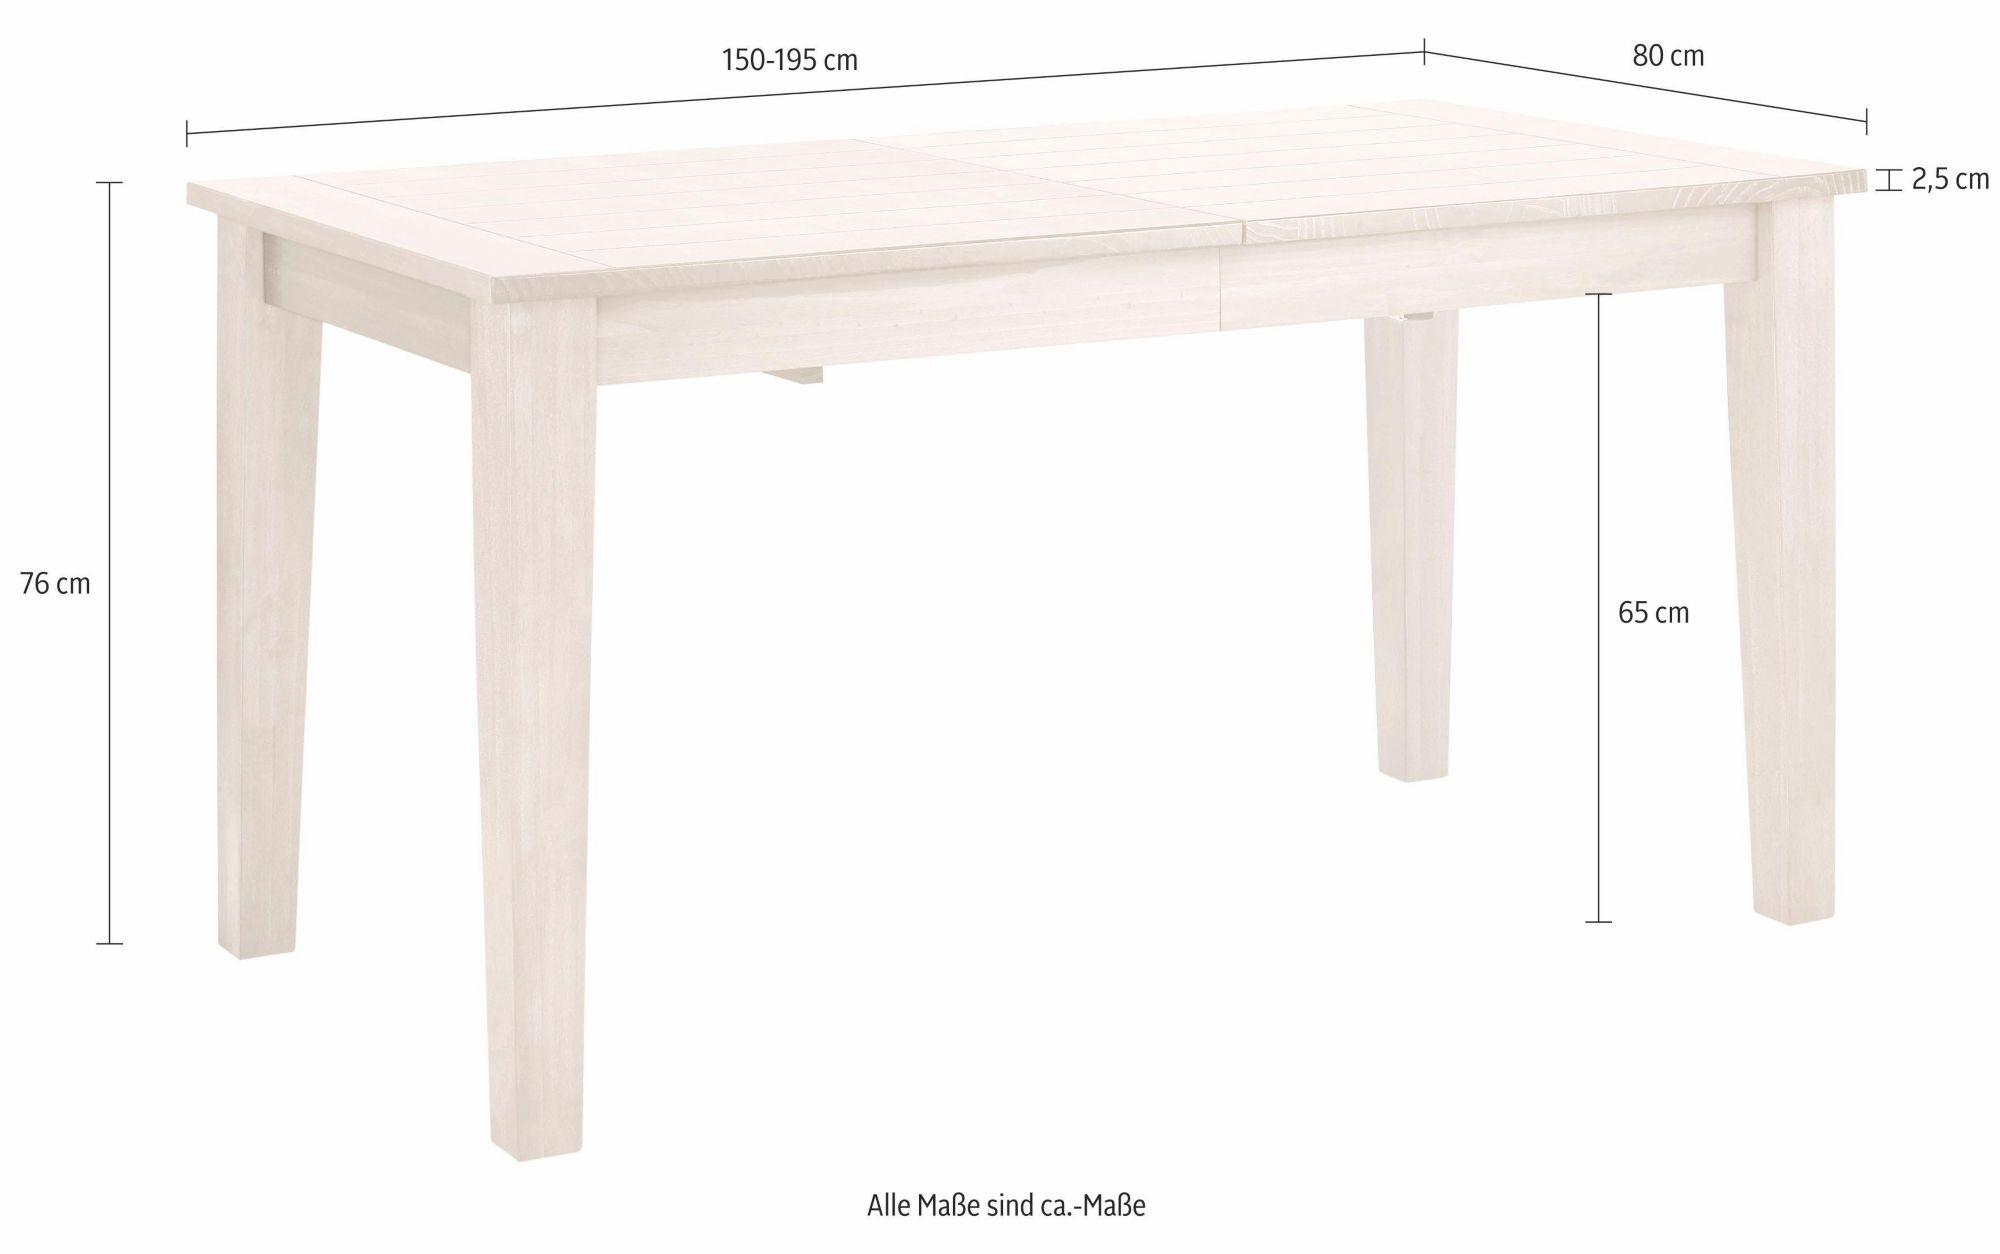 home affaire esstisch america in 2 gr en schwab. Black Bedroom Furniture Sets. Home Design Ideas